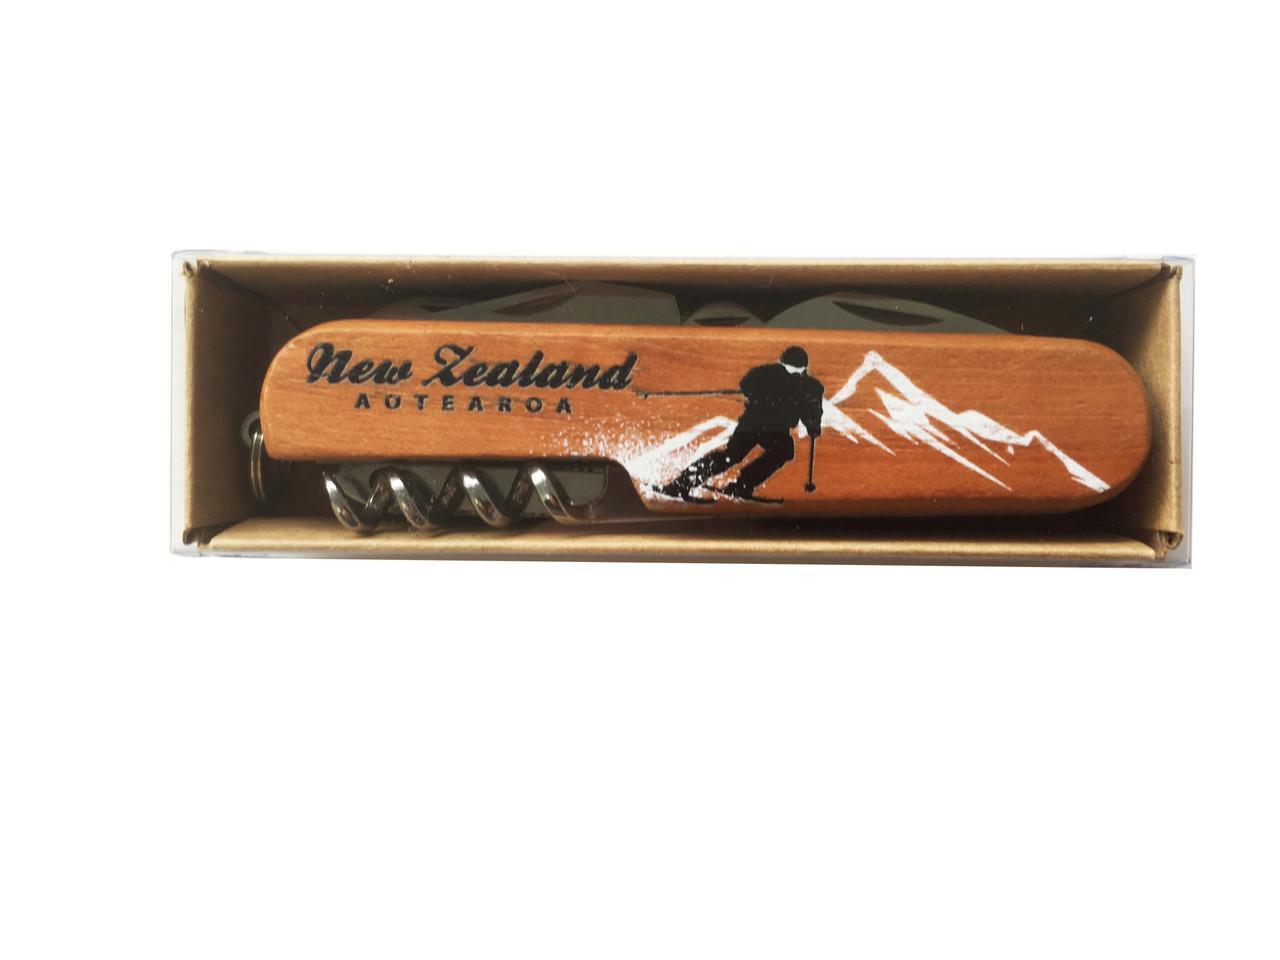 Multi Knife with Ski image